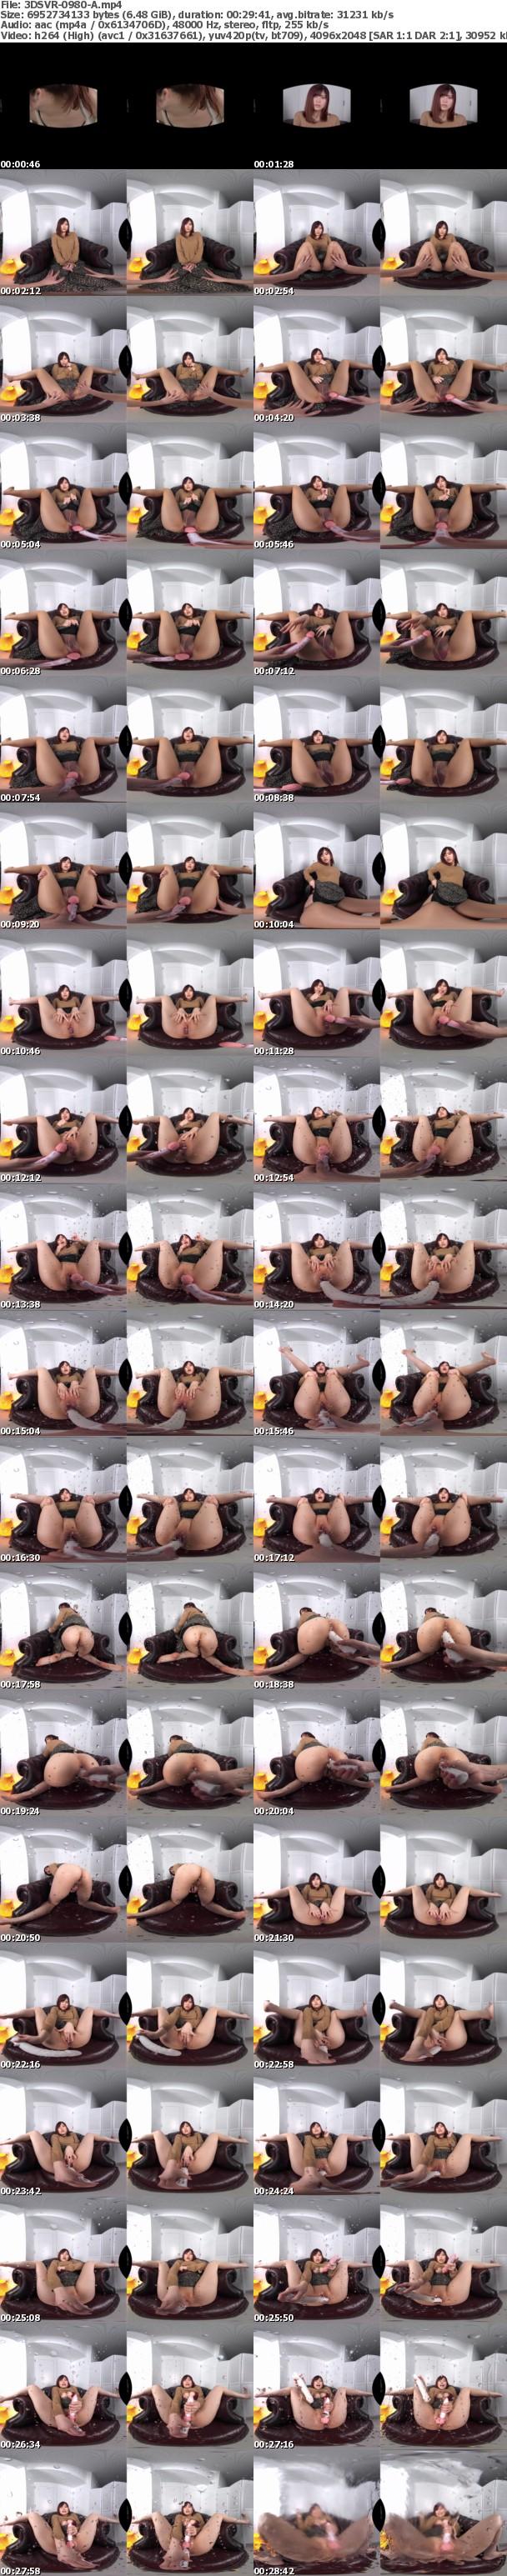 (VR) 3DSVR-0980 新技術「4K防水カメラ」で圧倒的没入感を実現! 潮浴び特化VR ~真性ドM人妻の大量イキ潮をにまみれ、変態SEXに酔う~ 望月あやか